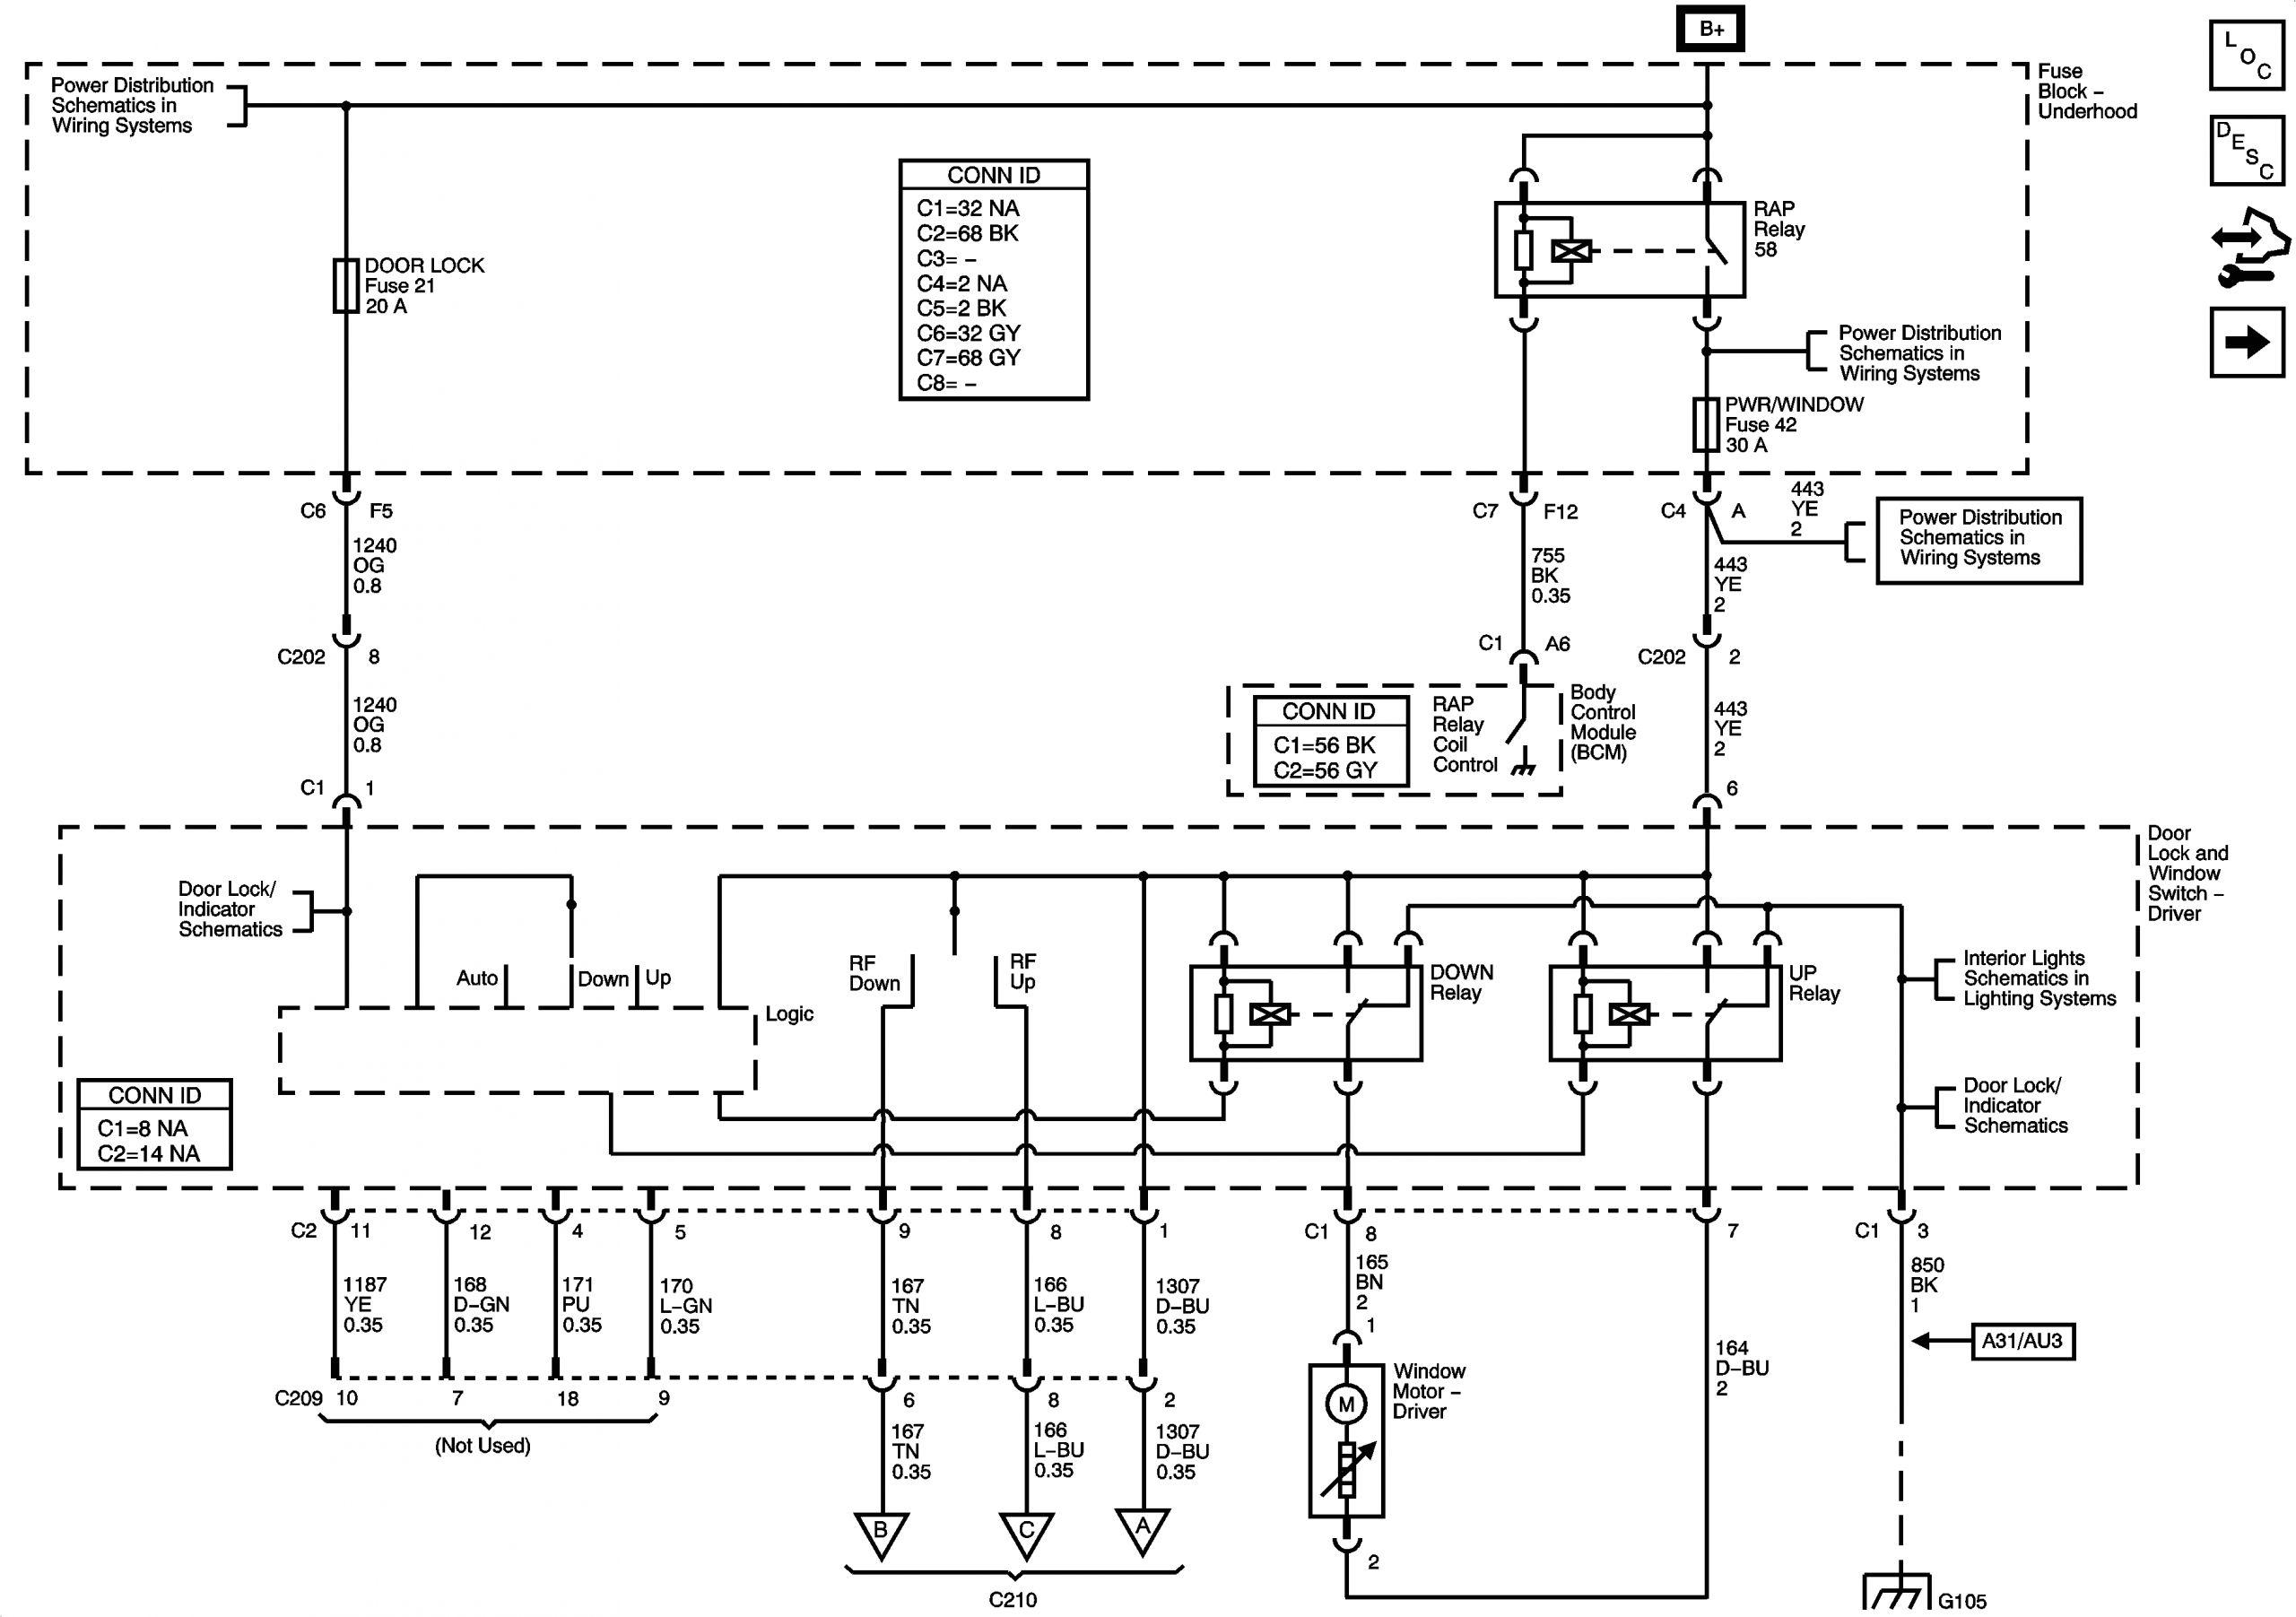 2005 chevy colorado wiring diagram image diagram about chevy colorado blower motor resistor wiring rh b2networks co 18l gif